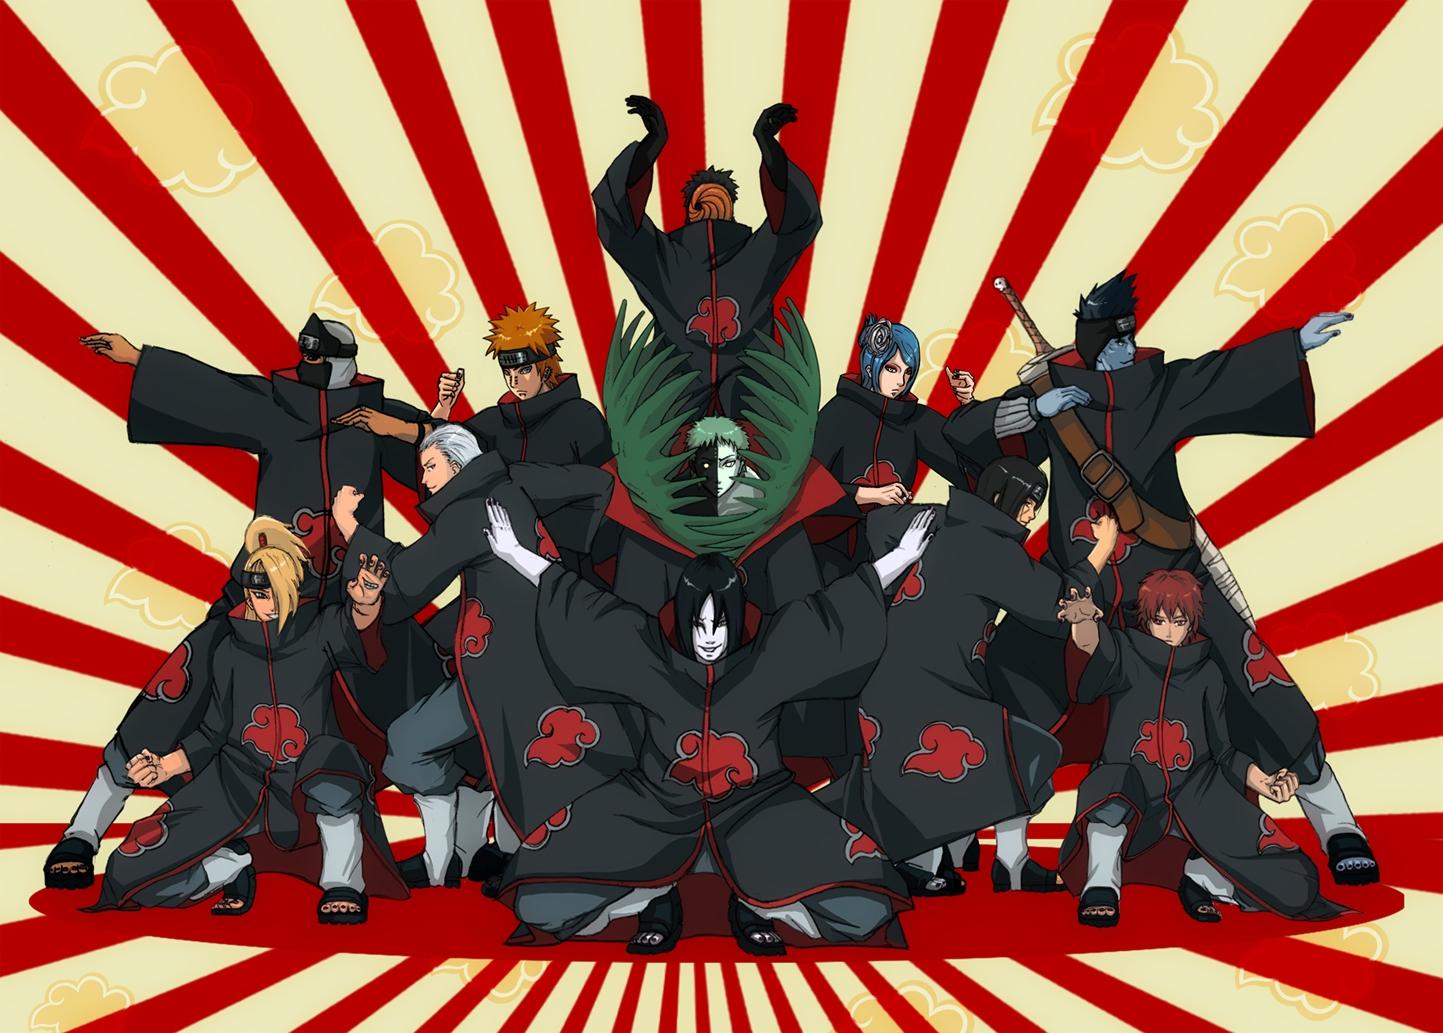 Naruto Wallpapers Akatsuki Download Wallpaper 1443x1033